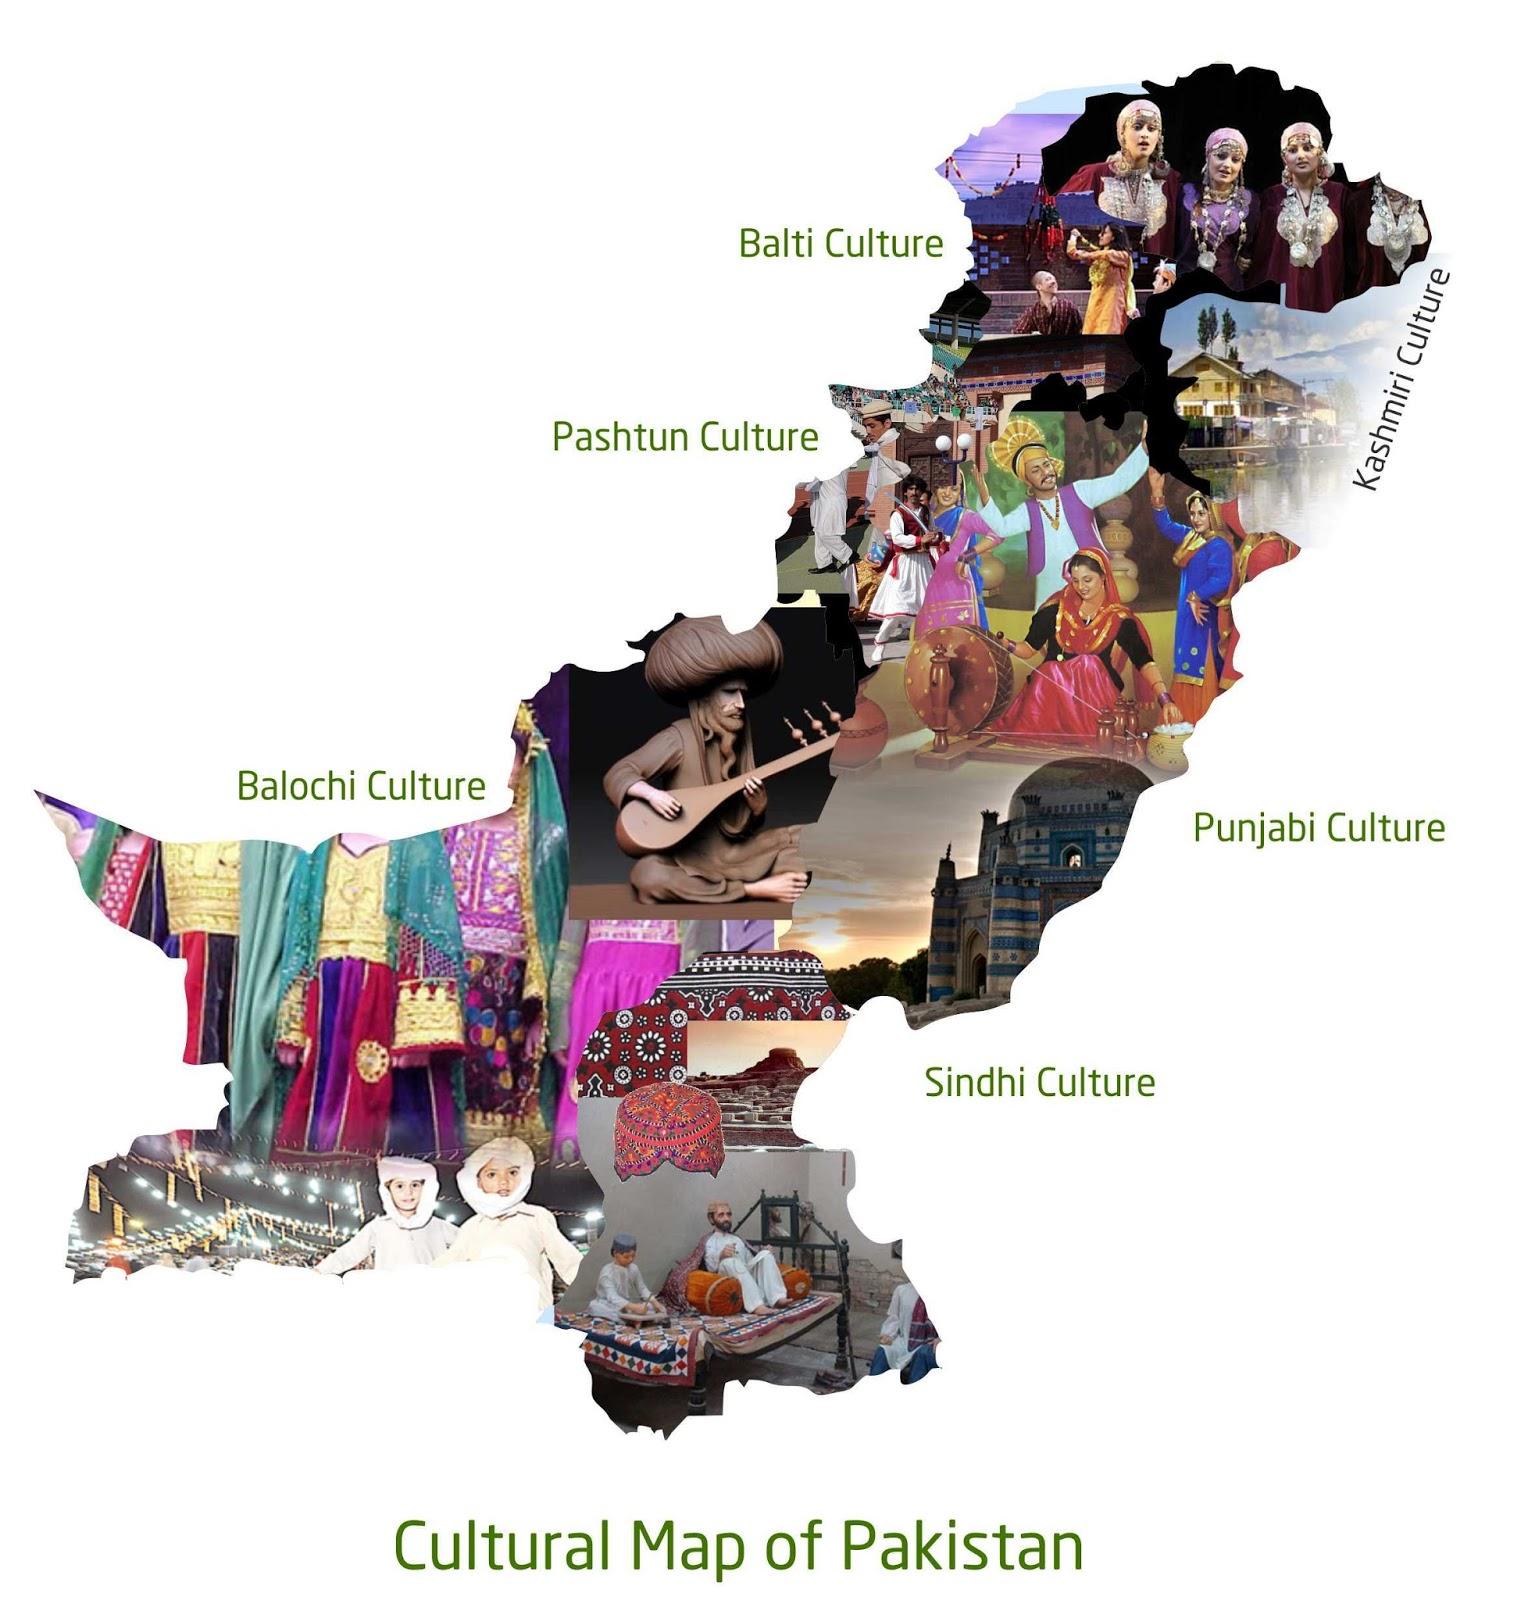 Pakistan Journey, Culture, Values: Culture